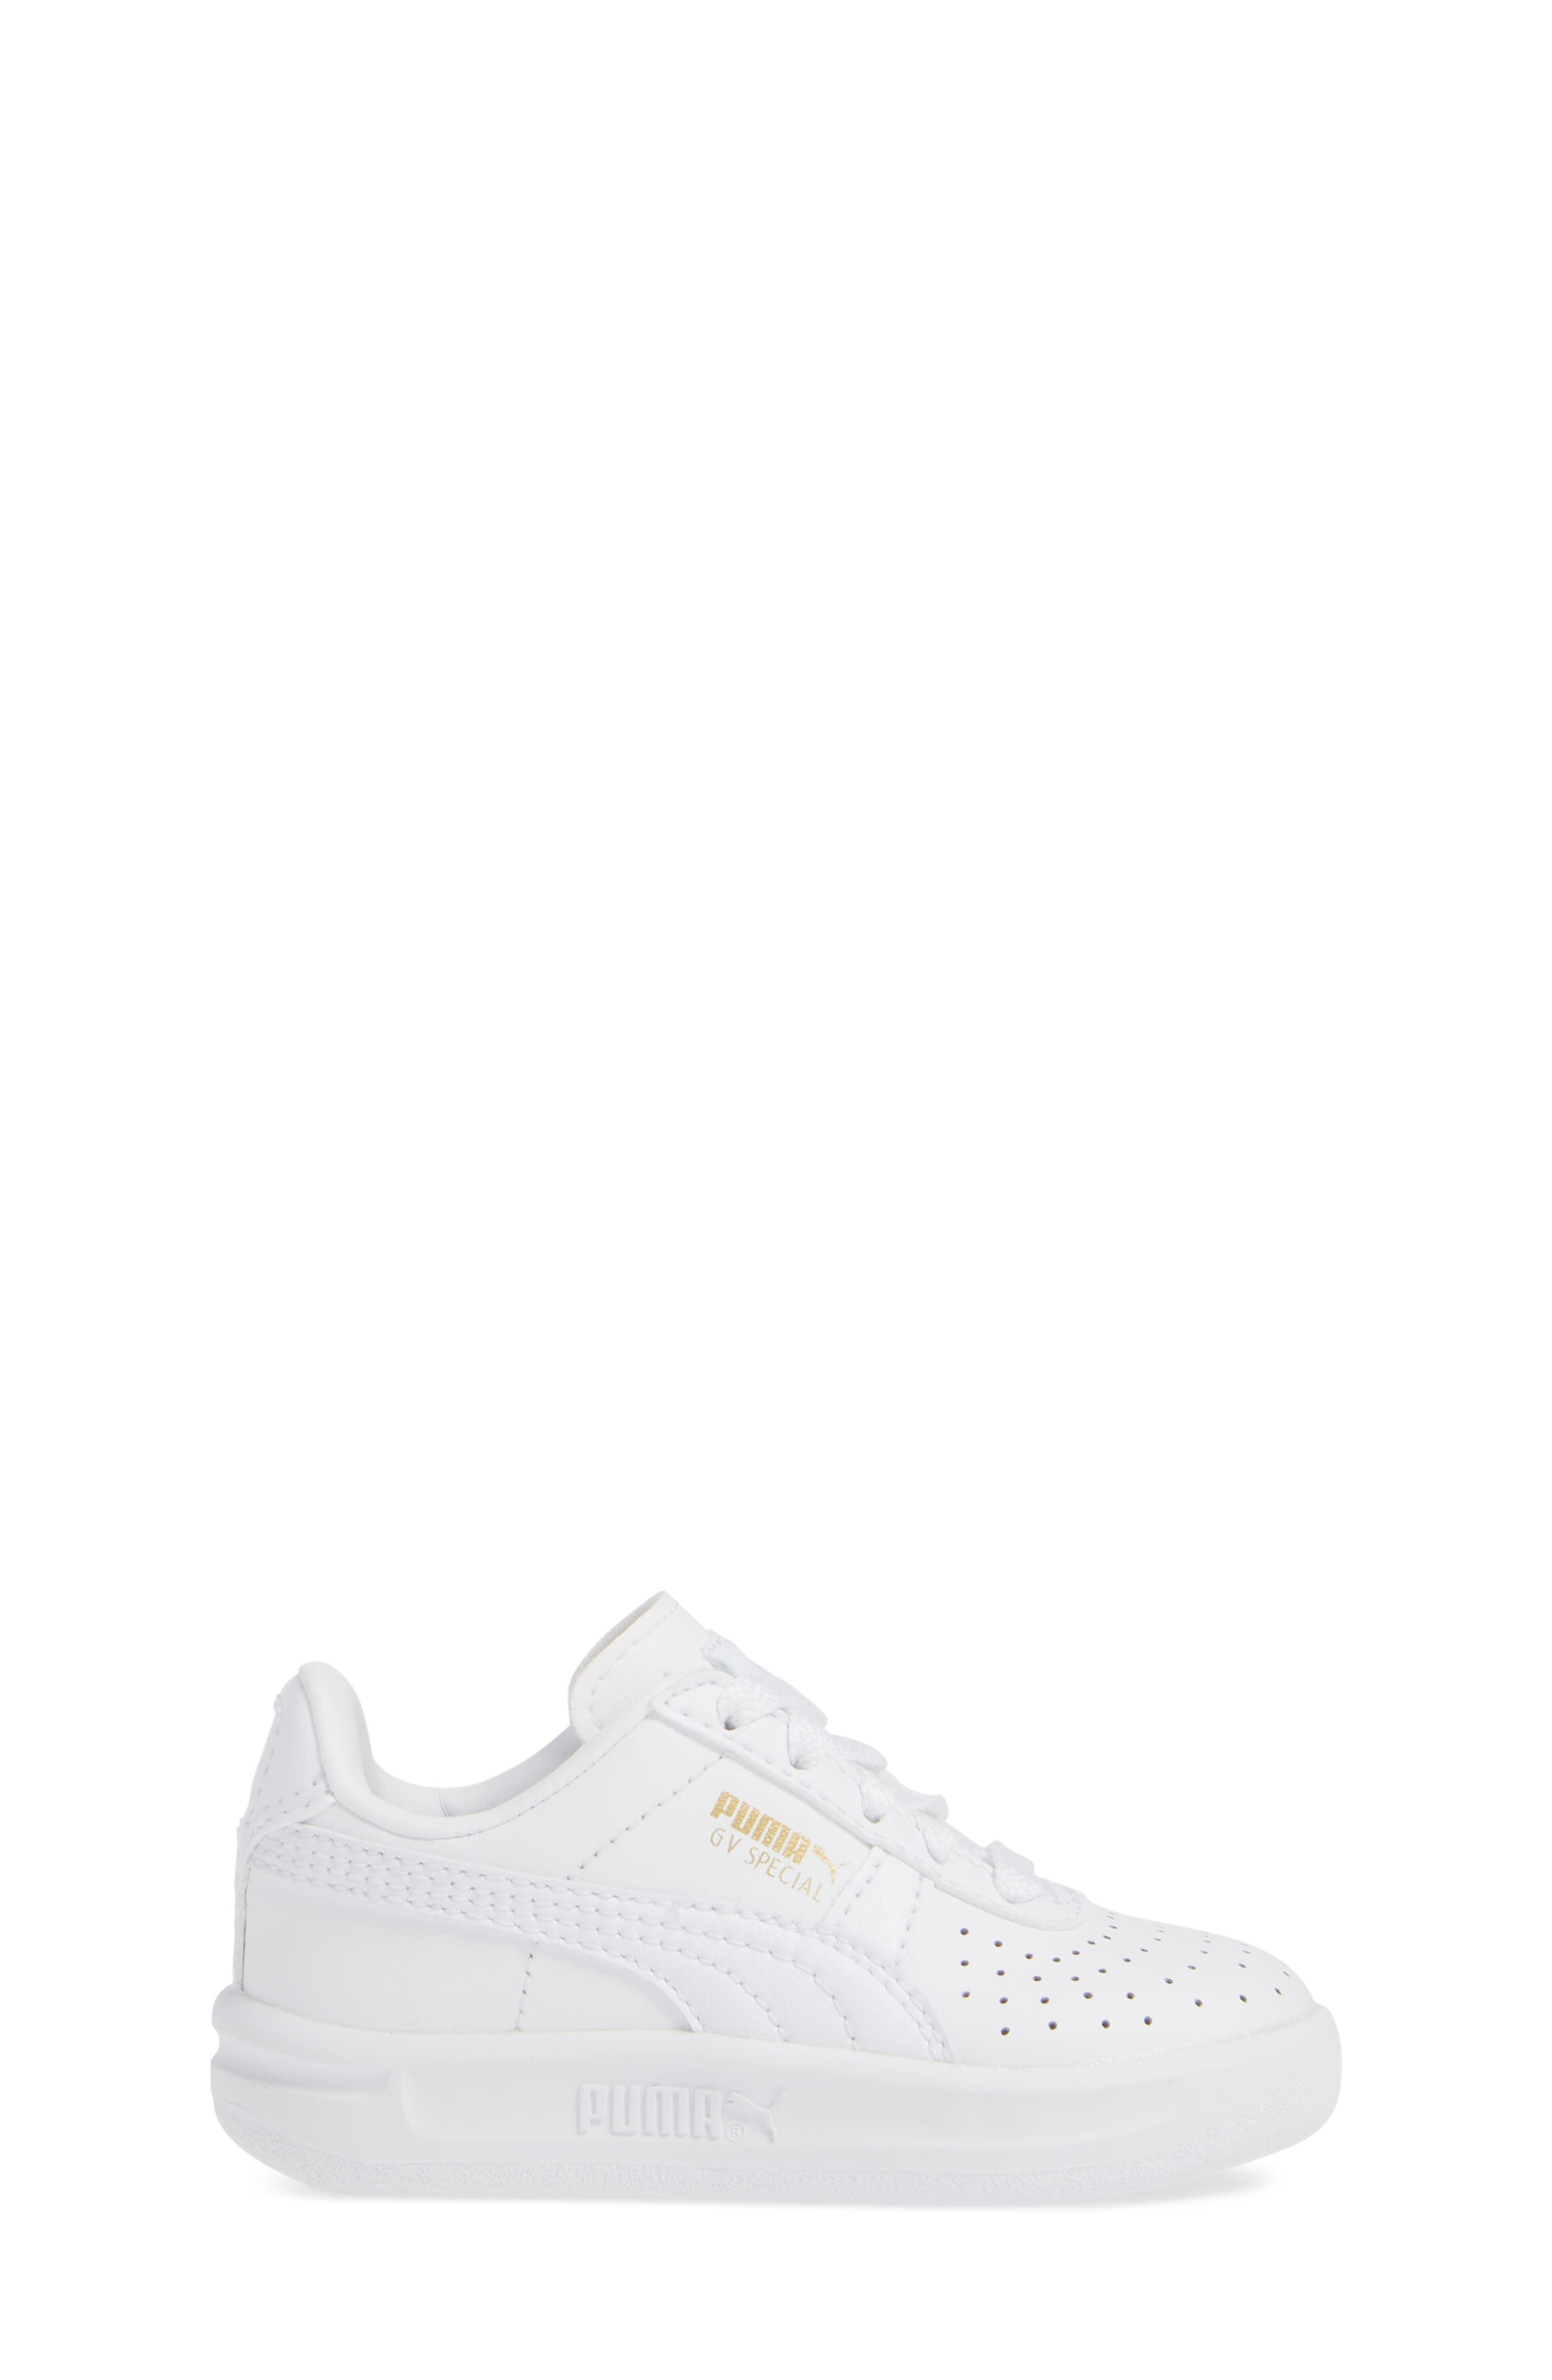 GV Special Sneaker,                             Alternate thumbnail 3, color,                             PUMA WHITE-PUMA TEAM GOLD